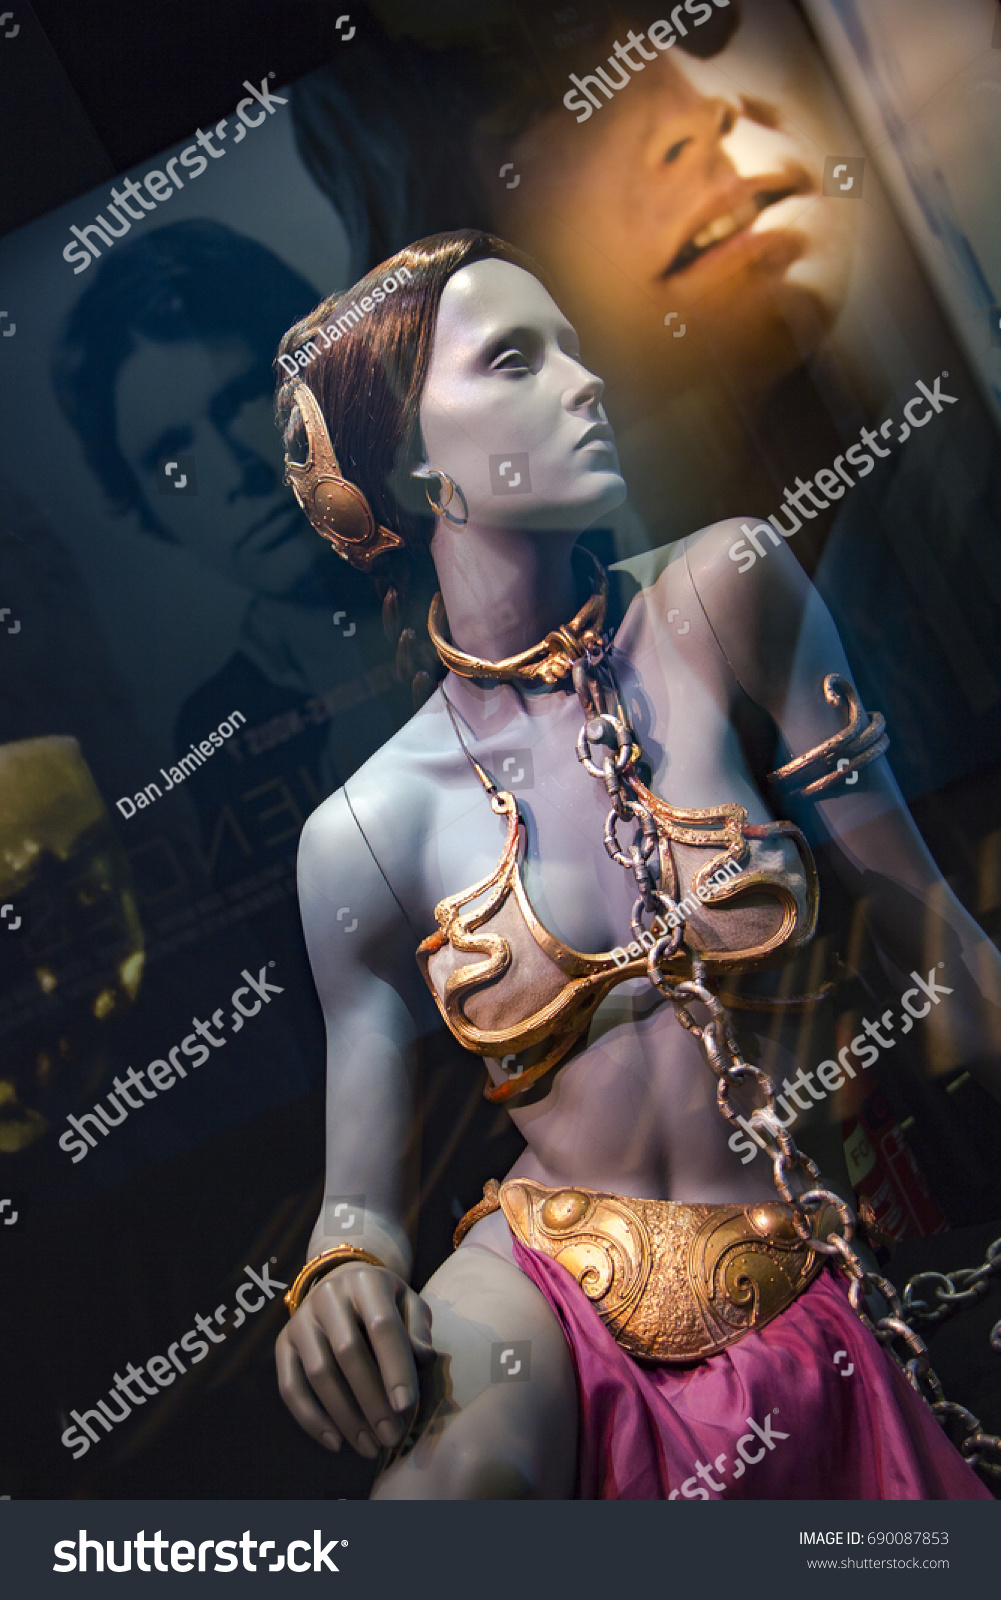 Original Princess Leia Slave Bikini Costume The Arts Stock Image